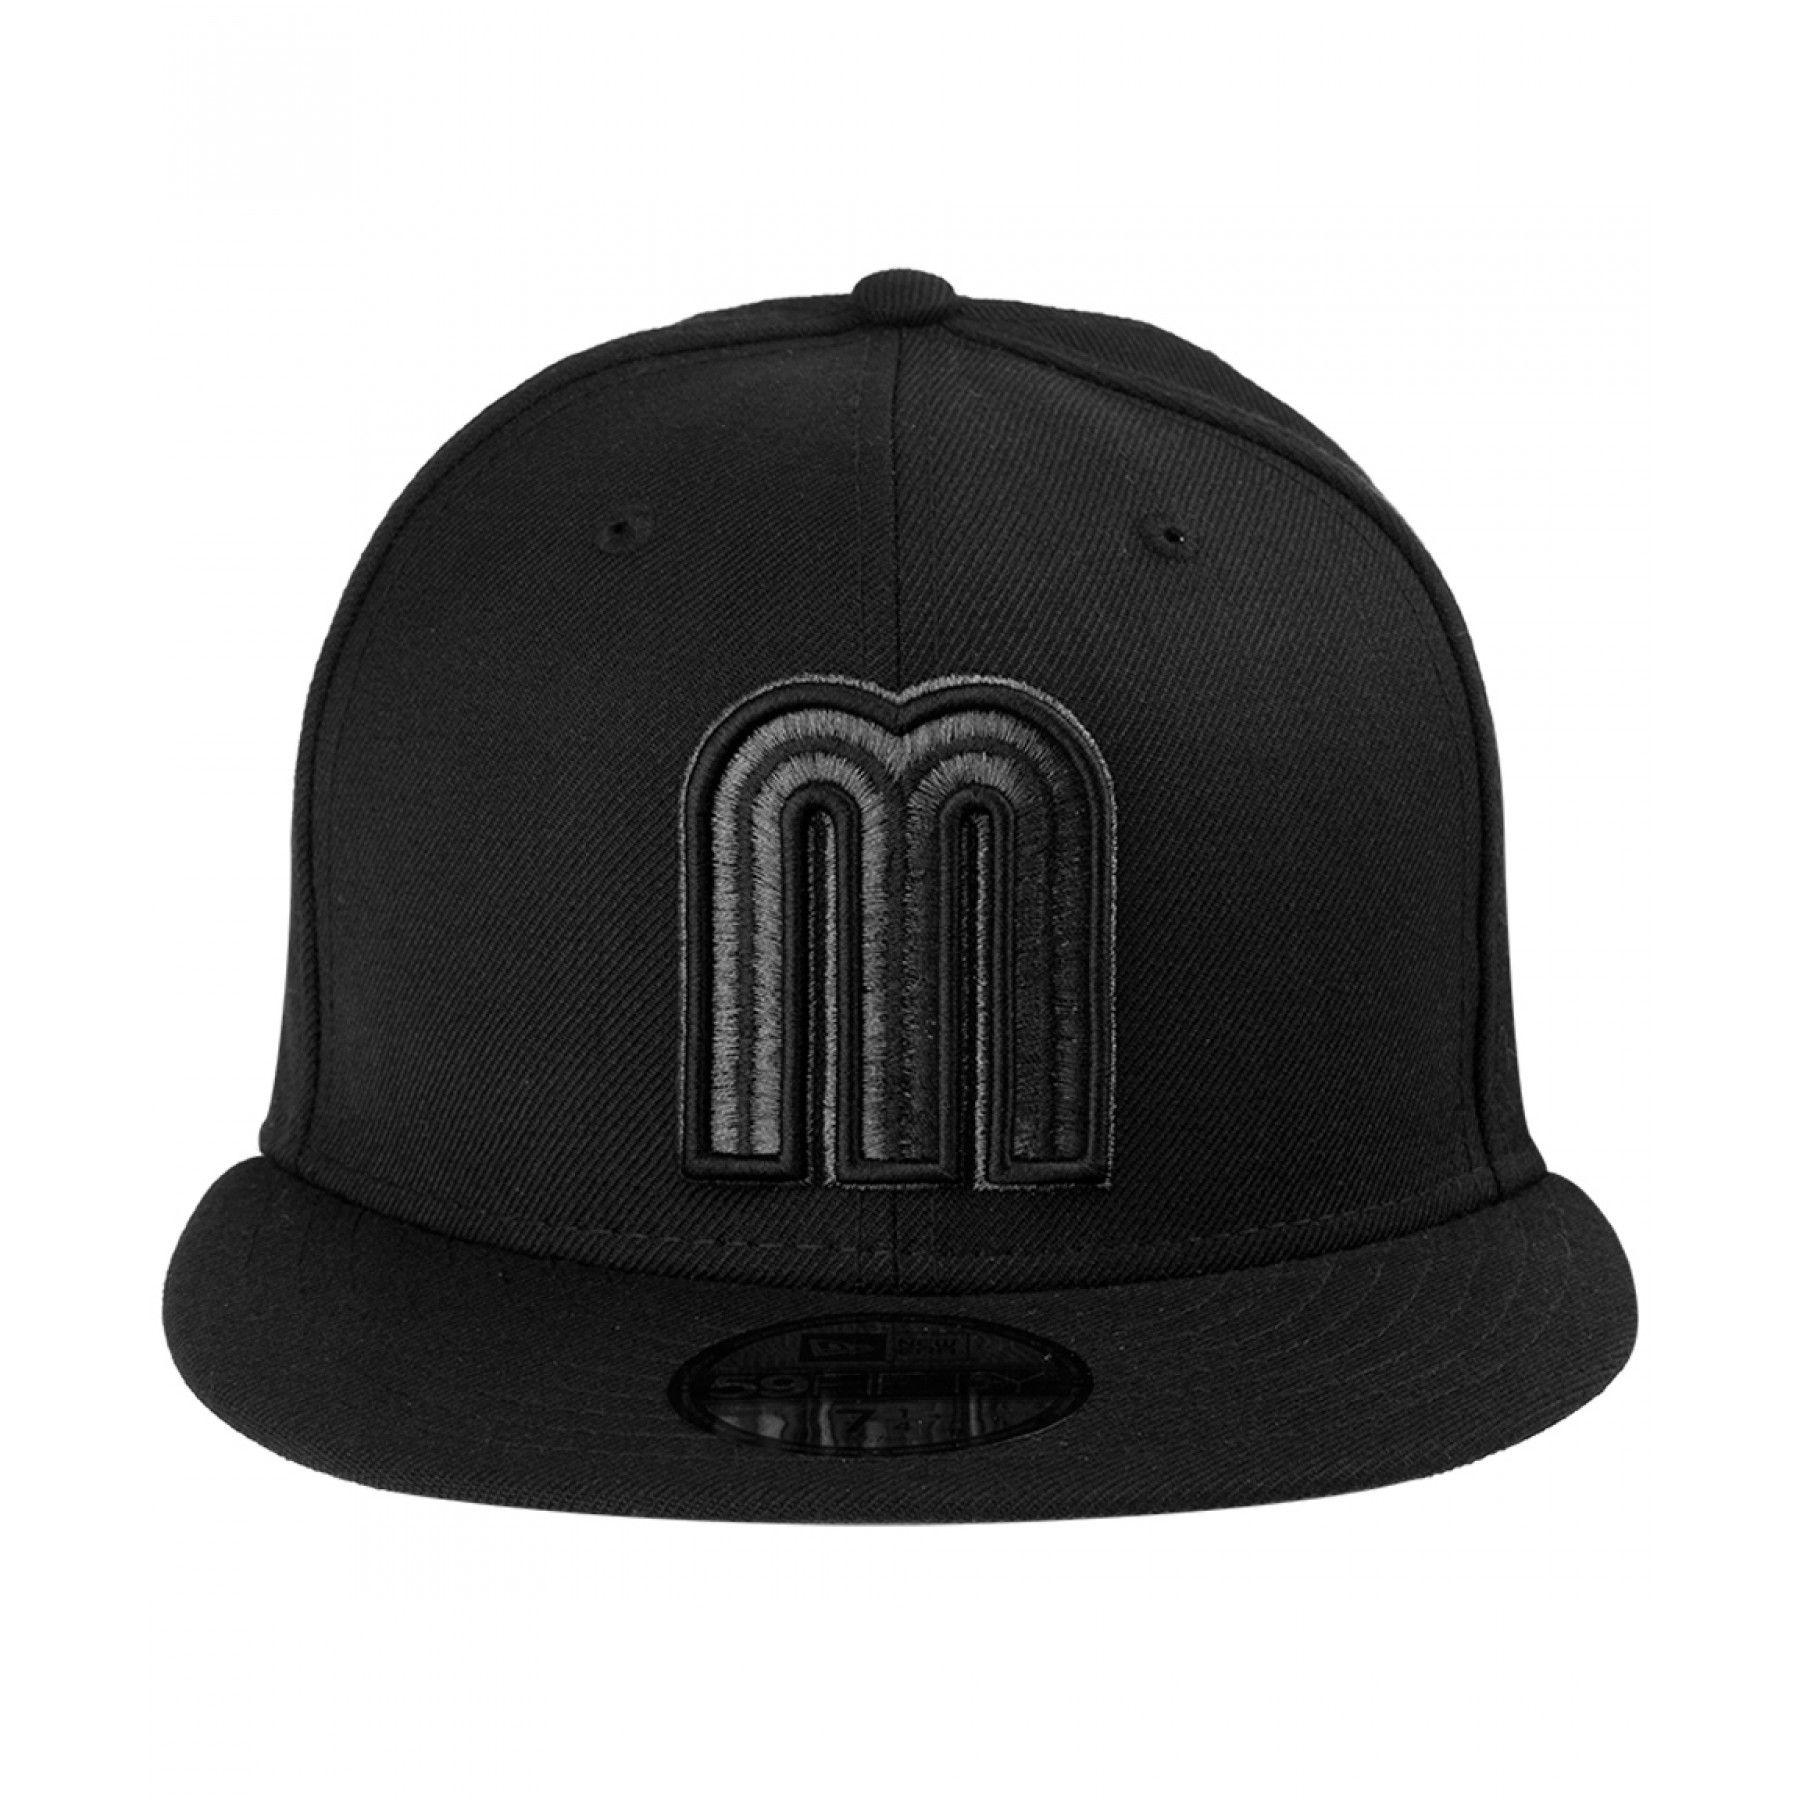 Gorra New Era para hombre en tejido de punto color negro con diseño alusivo  al clásico 21b631a190e